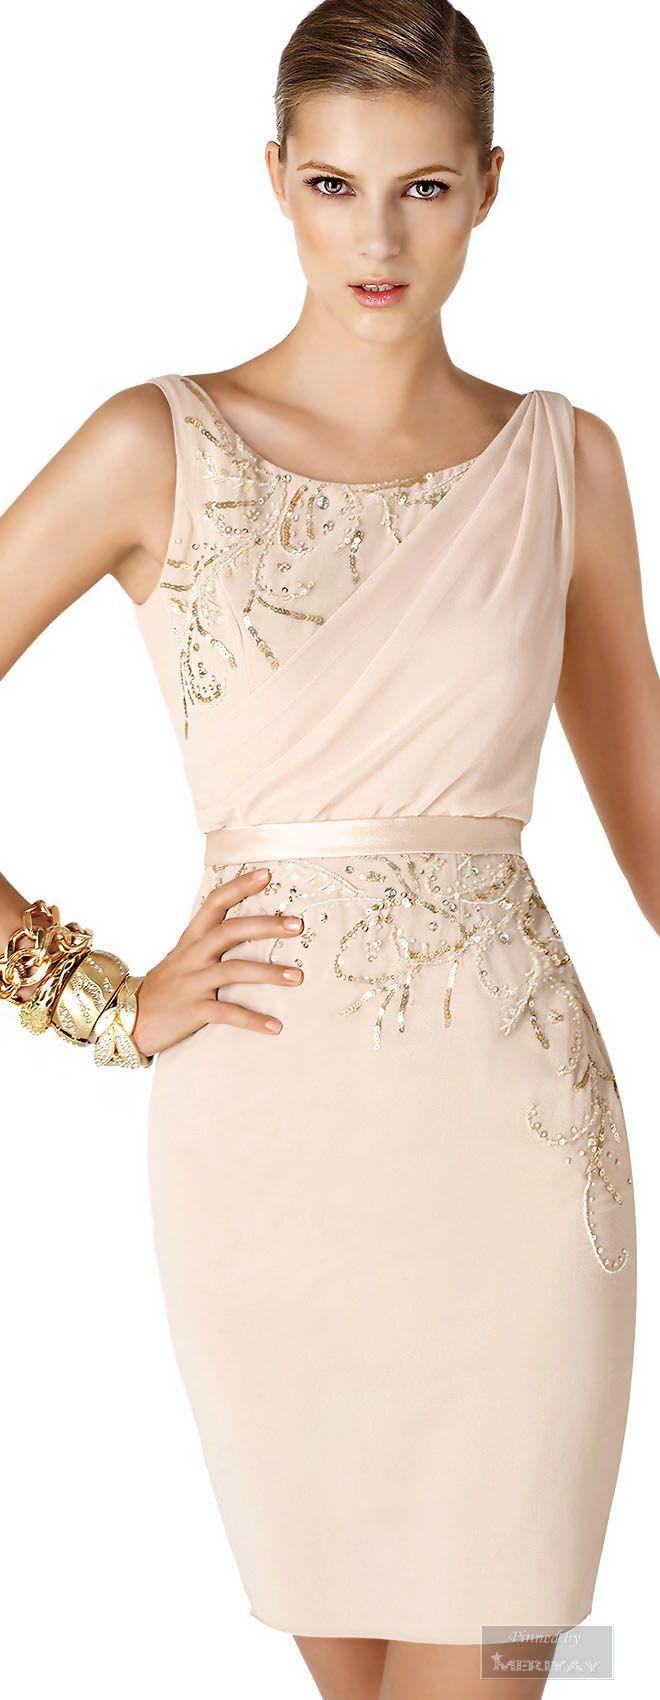 Women's fashion | Elegant sleeveless dress                              …